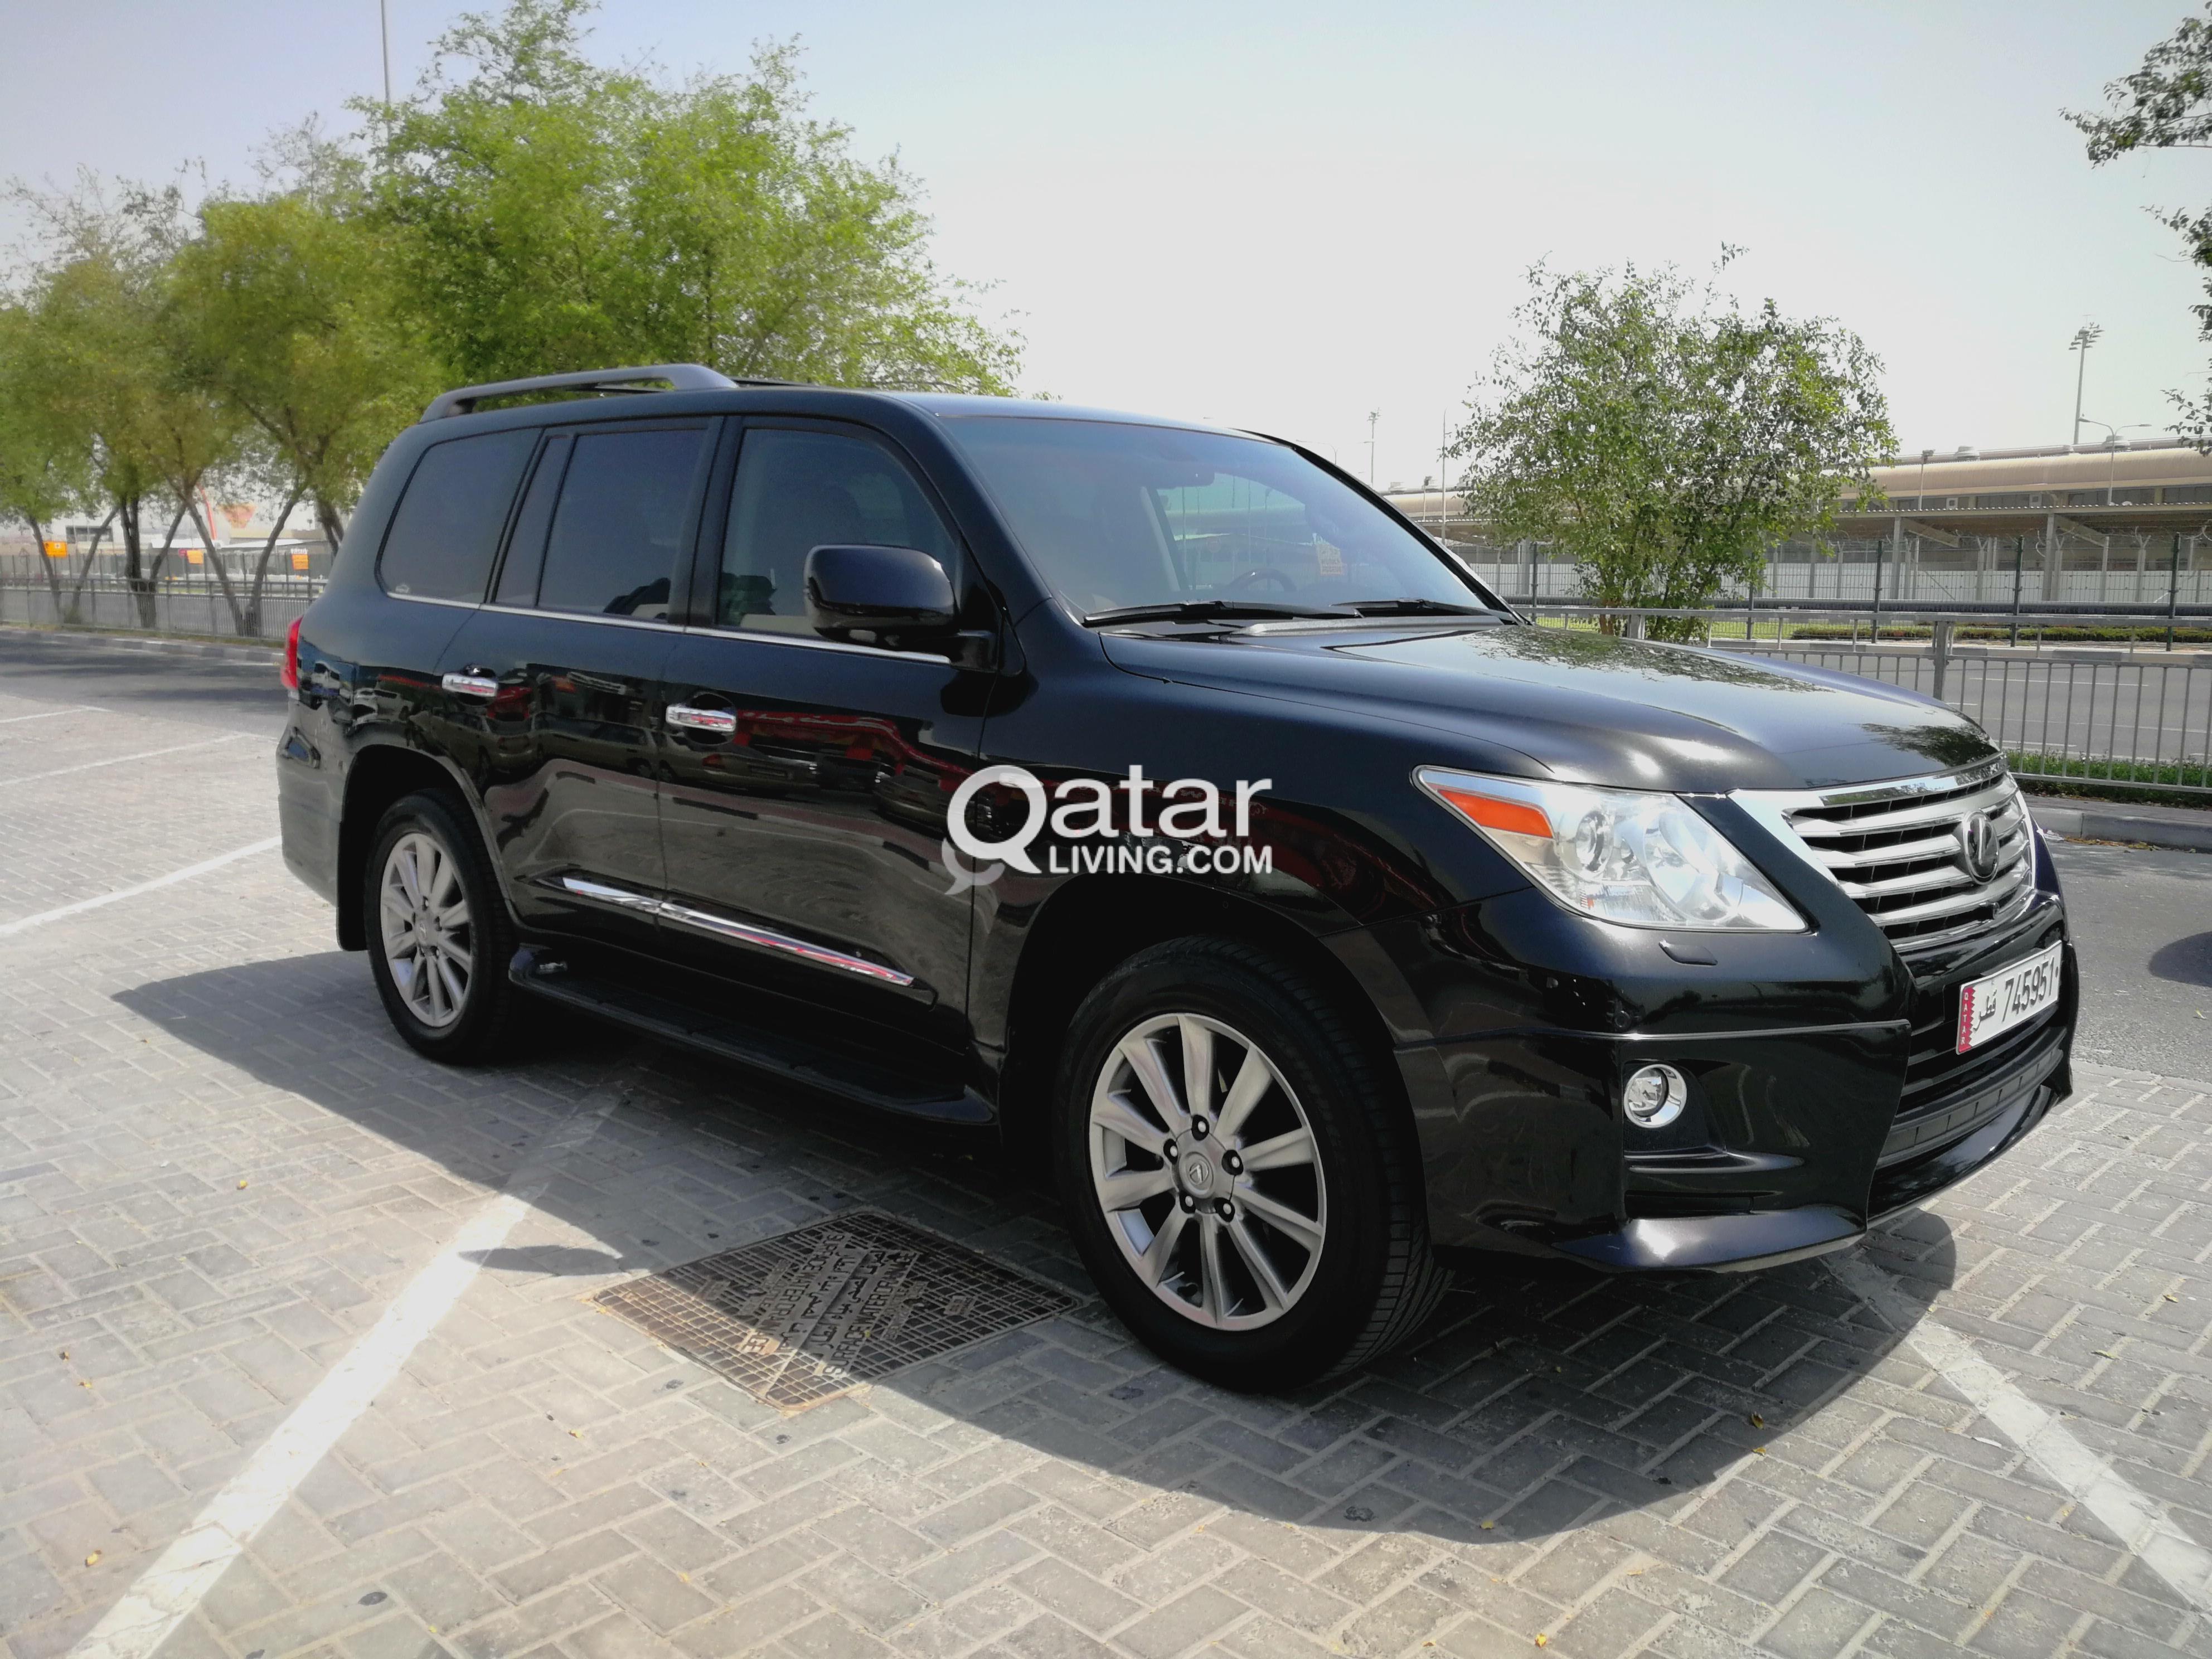 LEXUS LX 570 2011 FOR SALE | Qatar Living